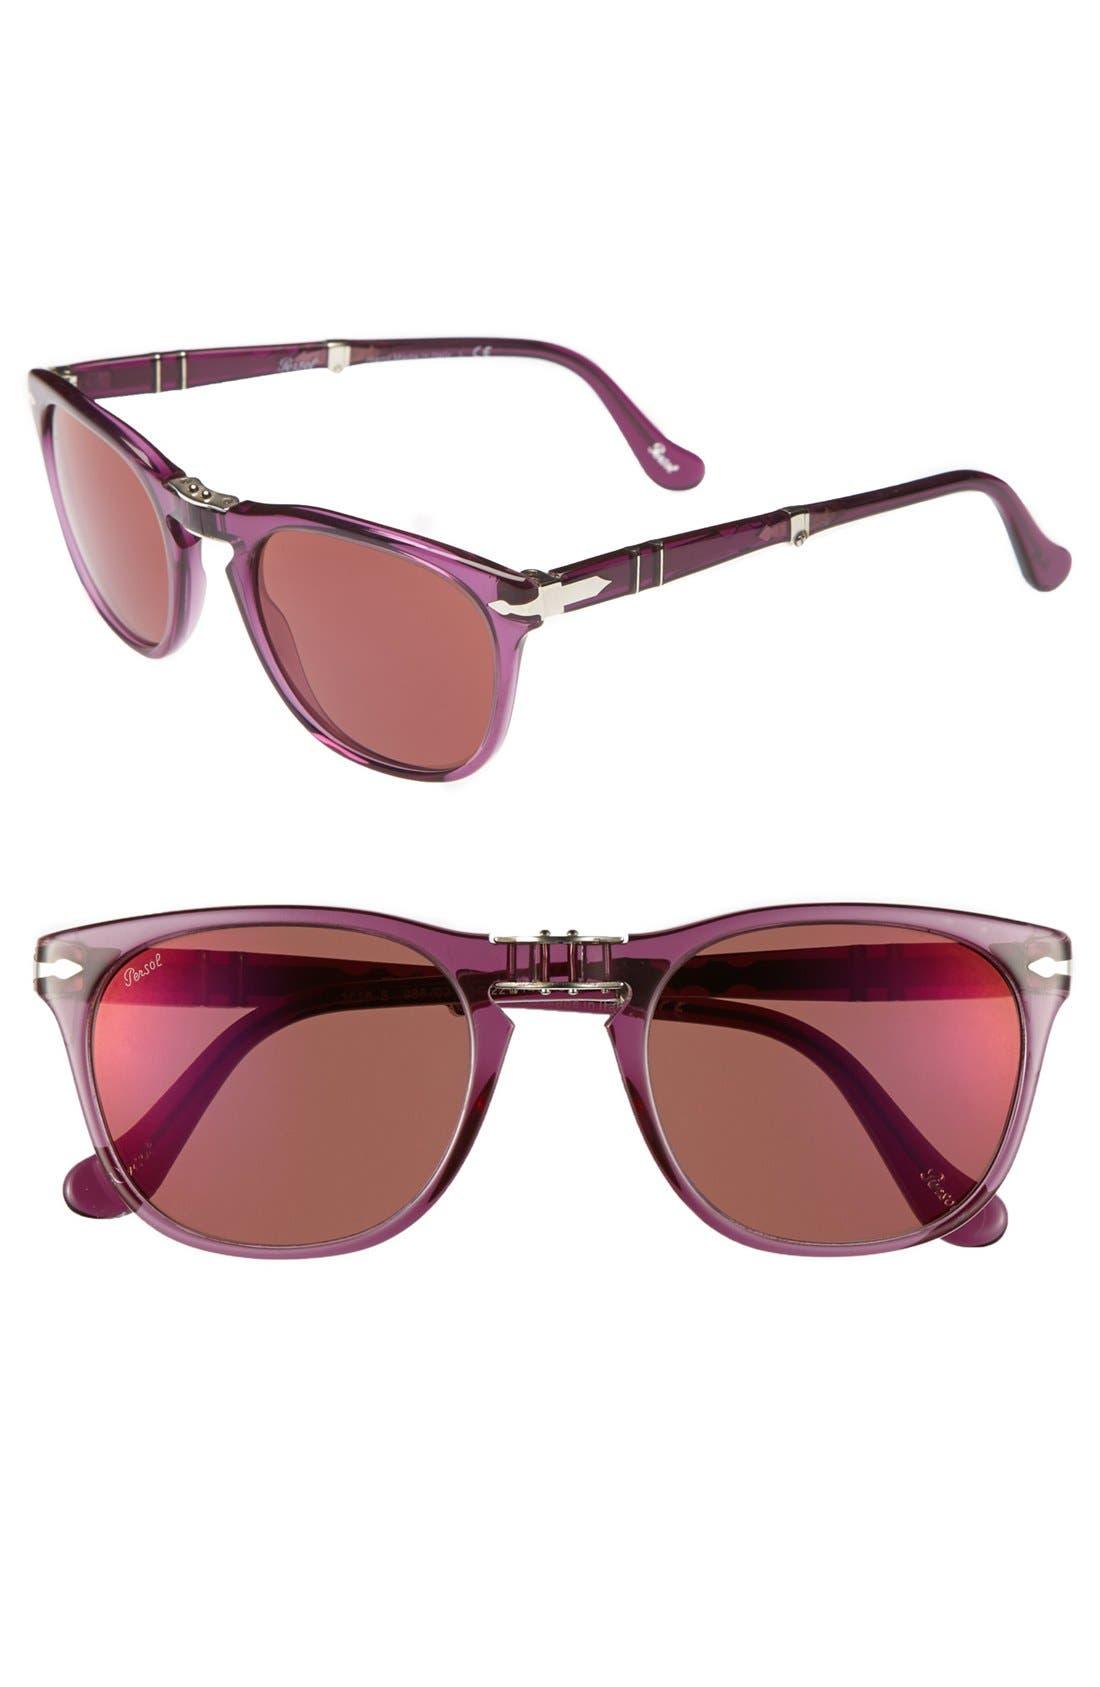 Main Image - Persol 52mm Folding Sunglasses